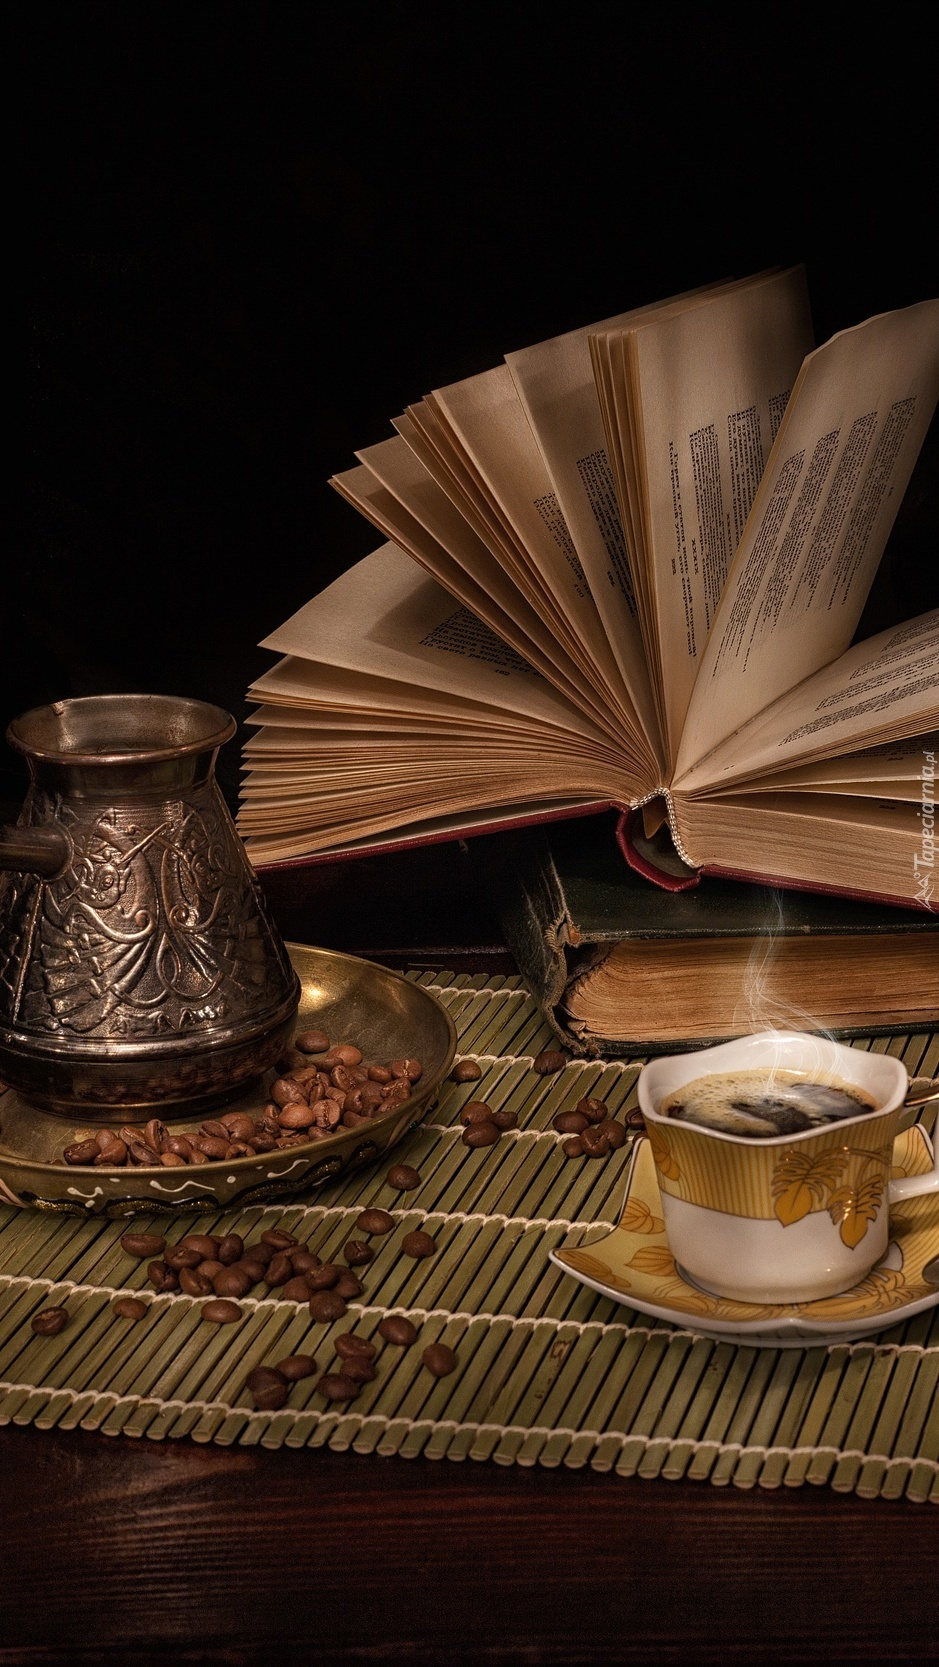 Filiżanka z kawą obok książek